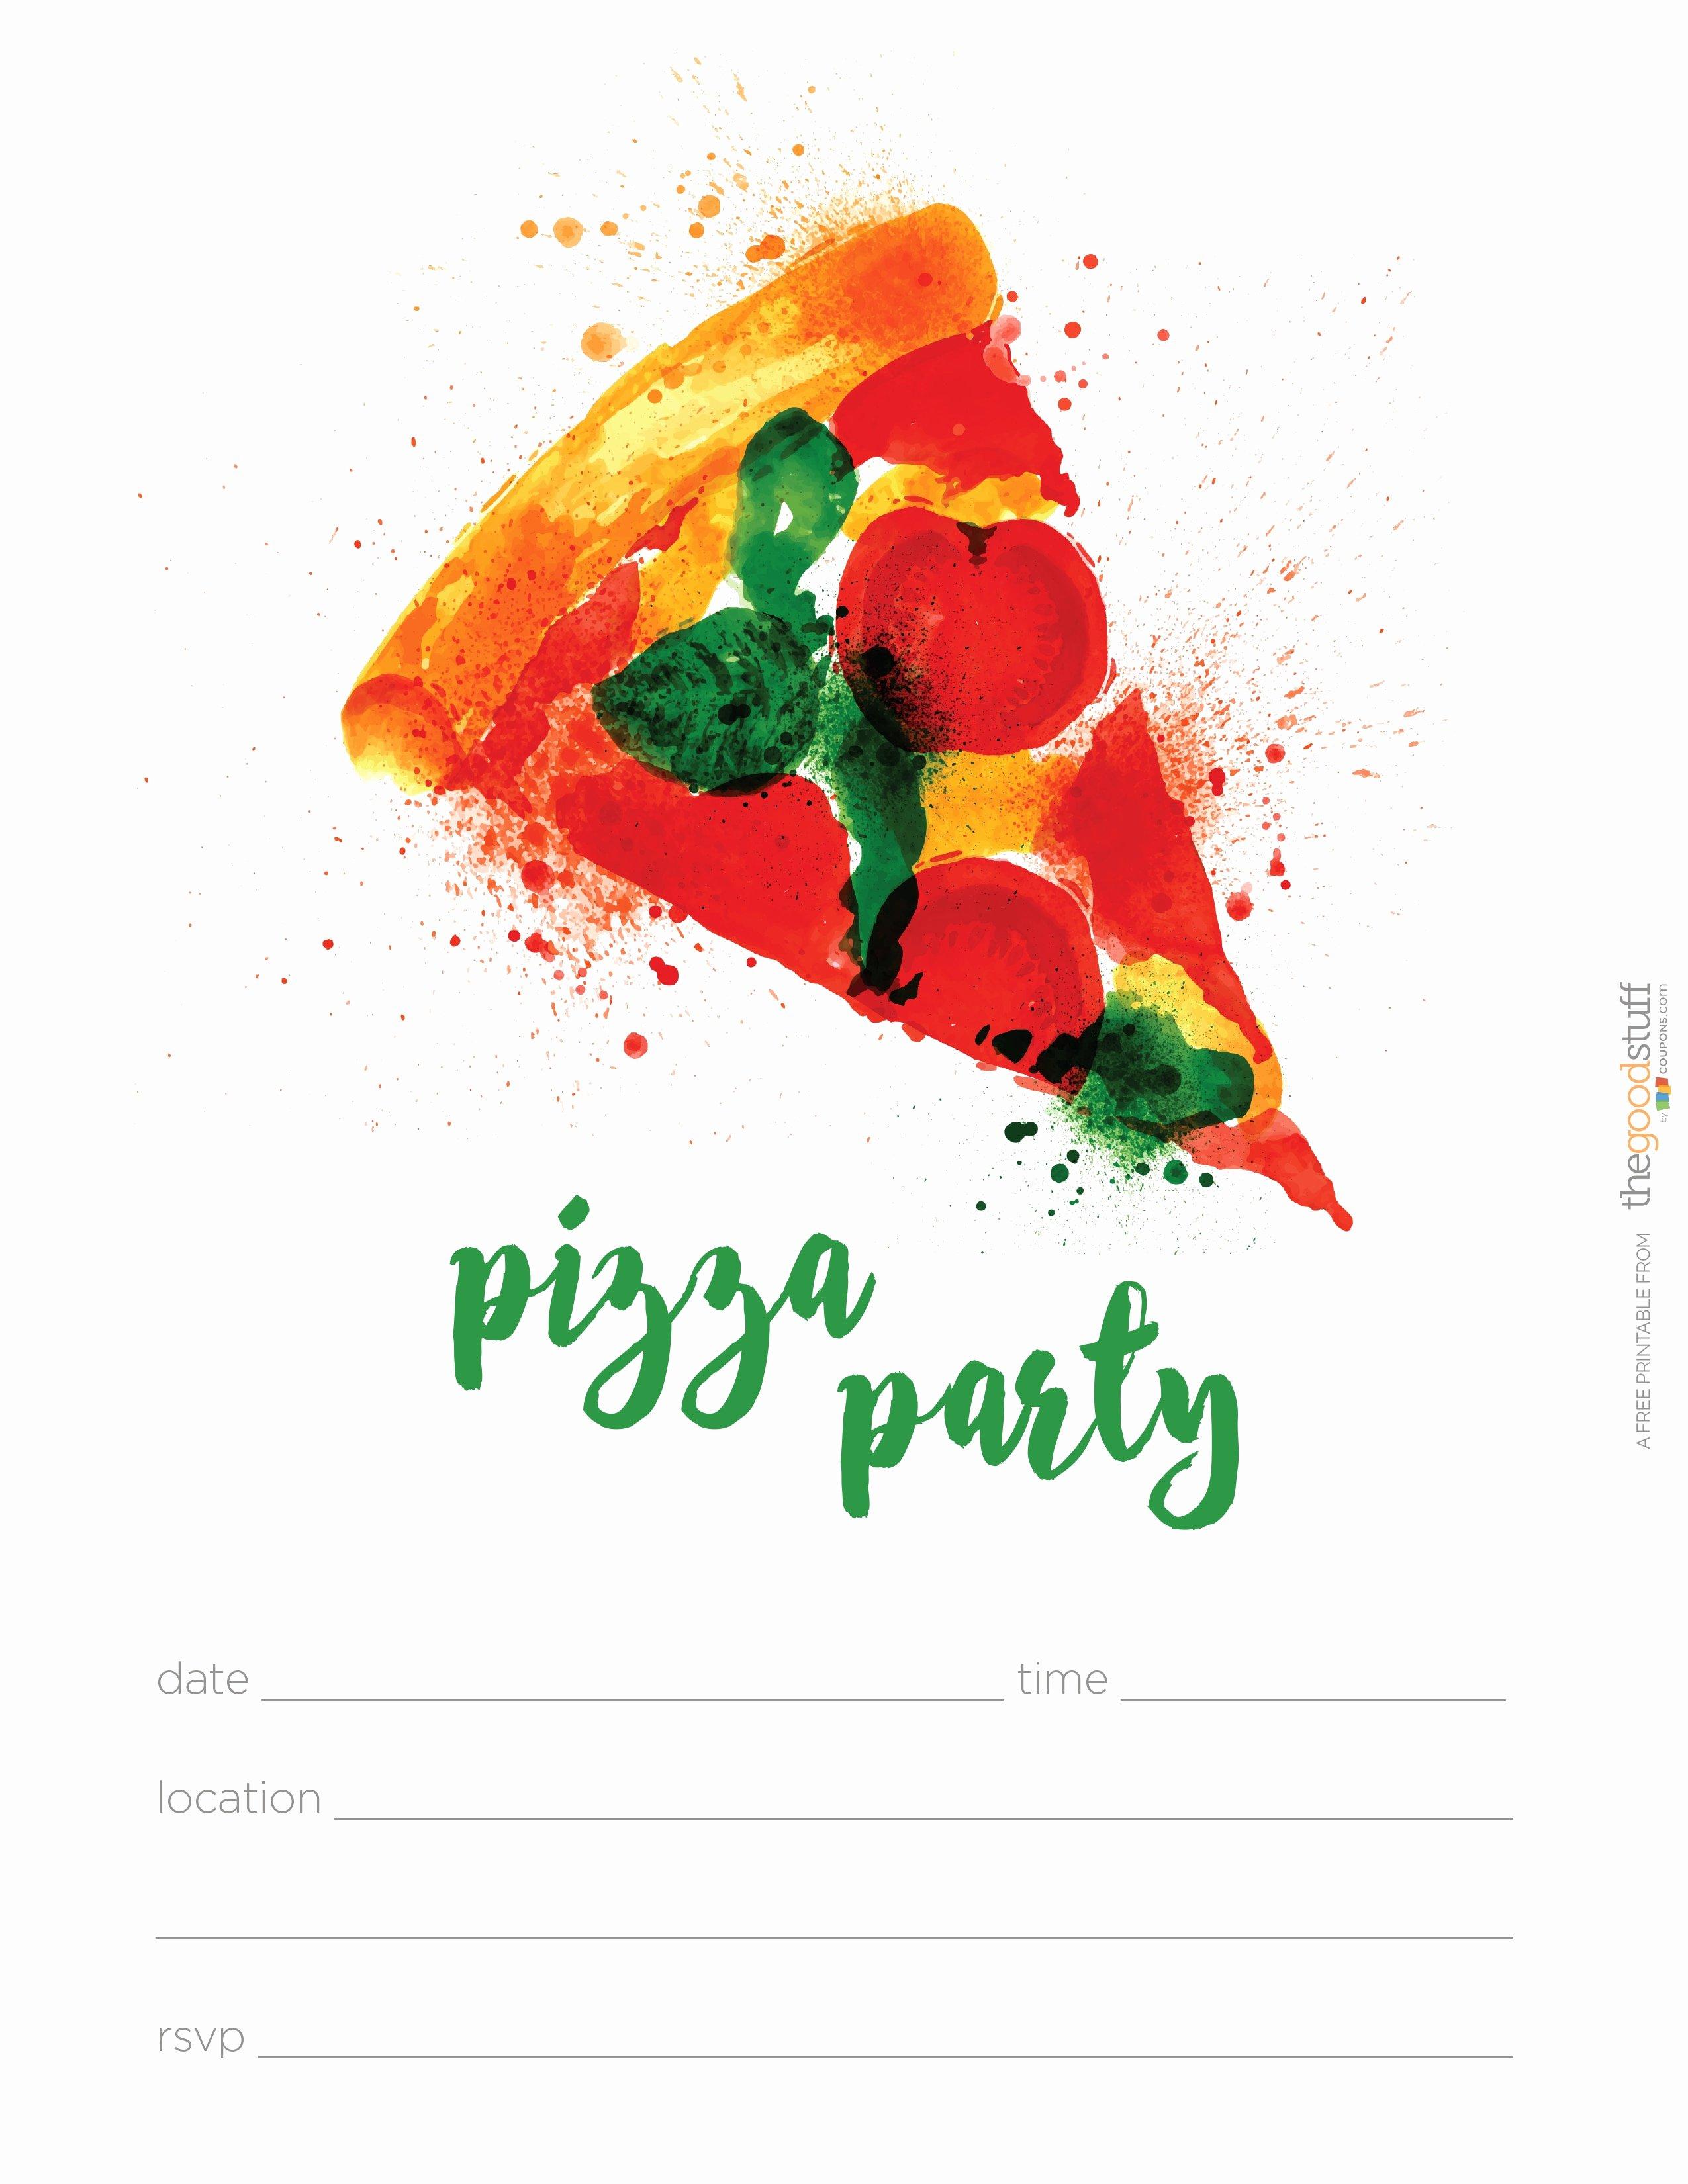 Pizza Party Invites Free Printable New Hostess Helpers Free Pizza Party Printables thegoodstuff